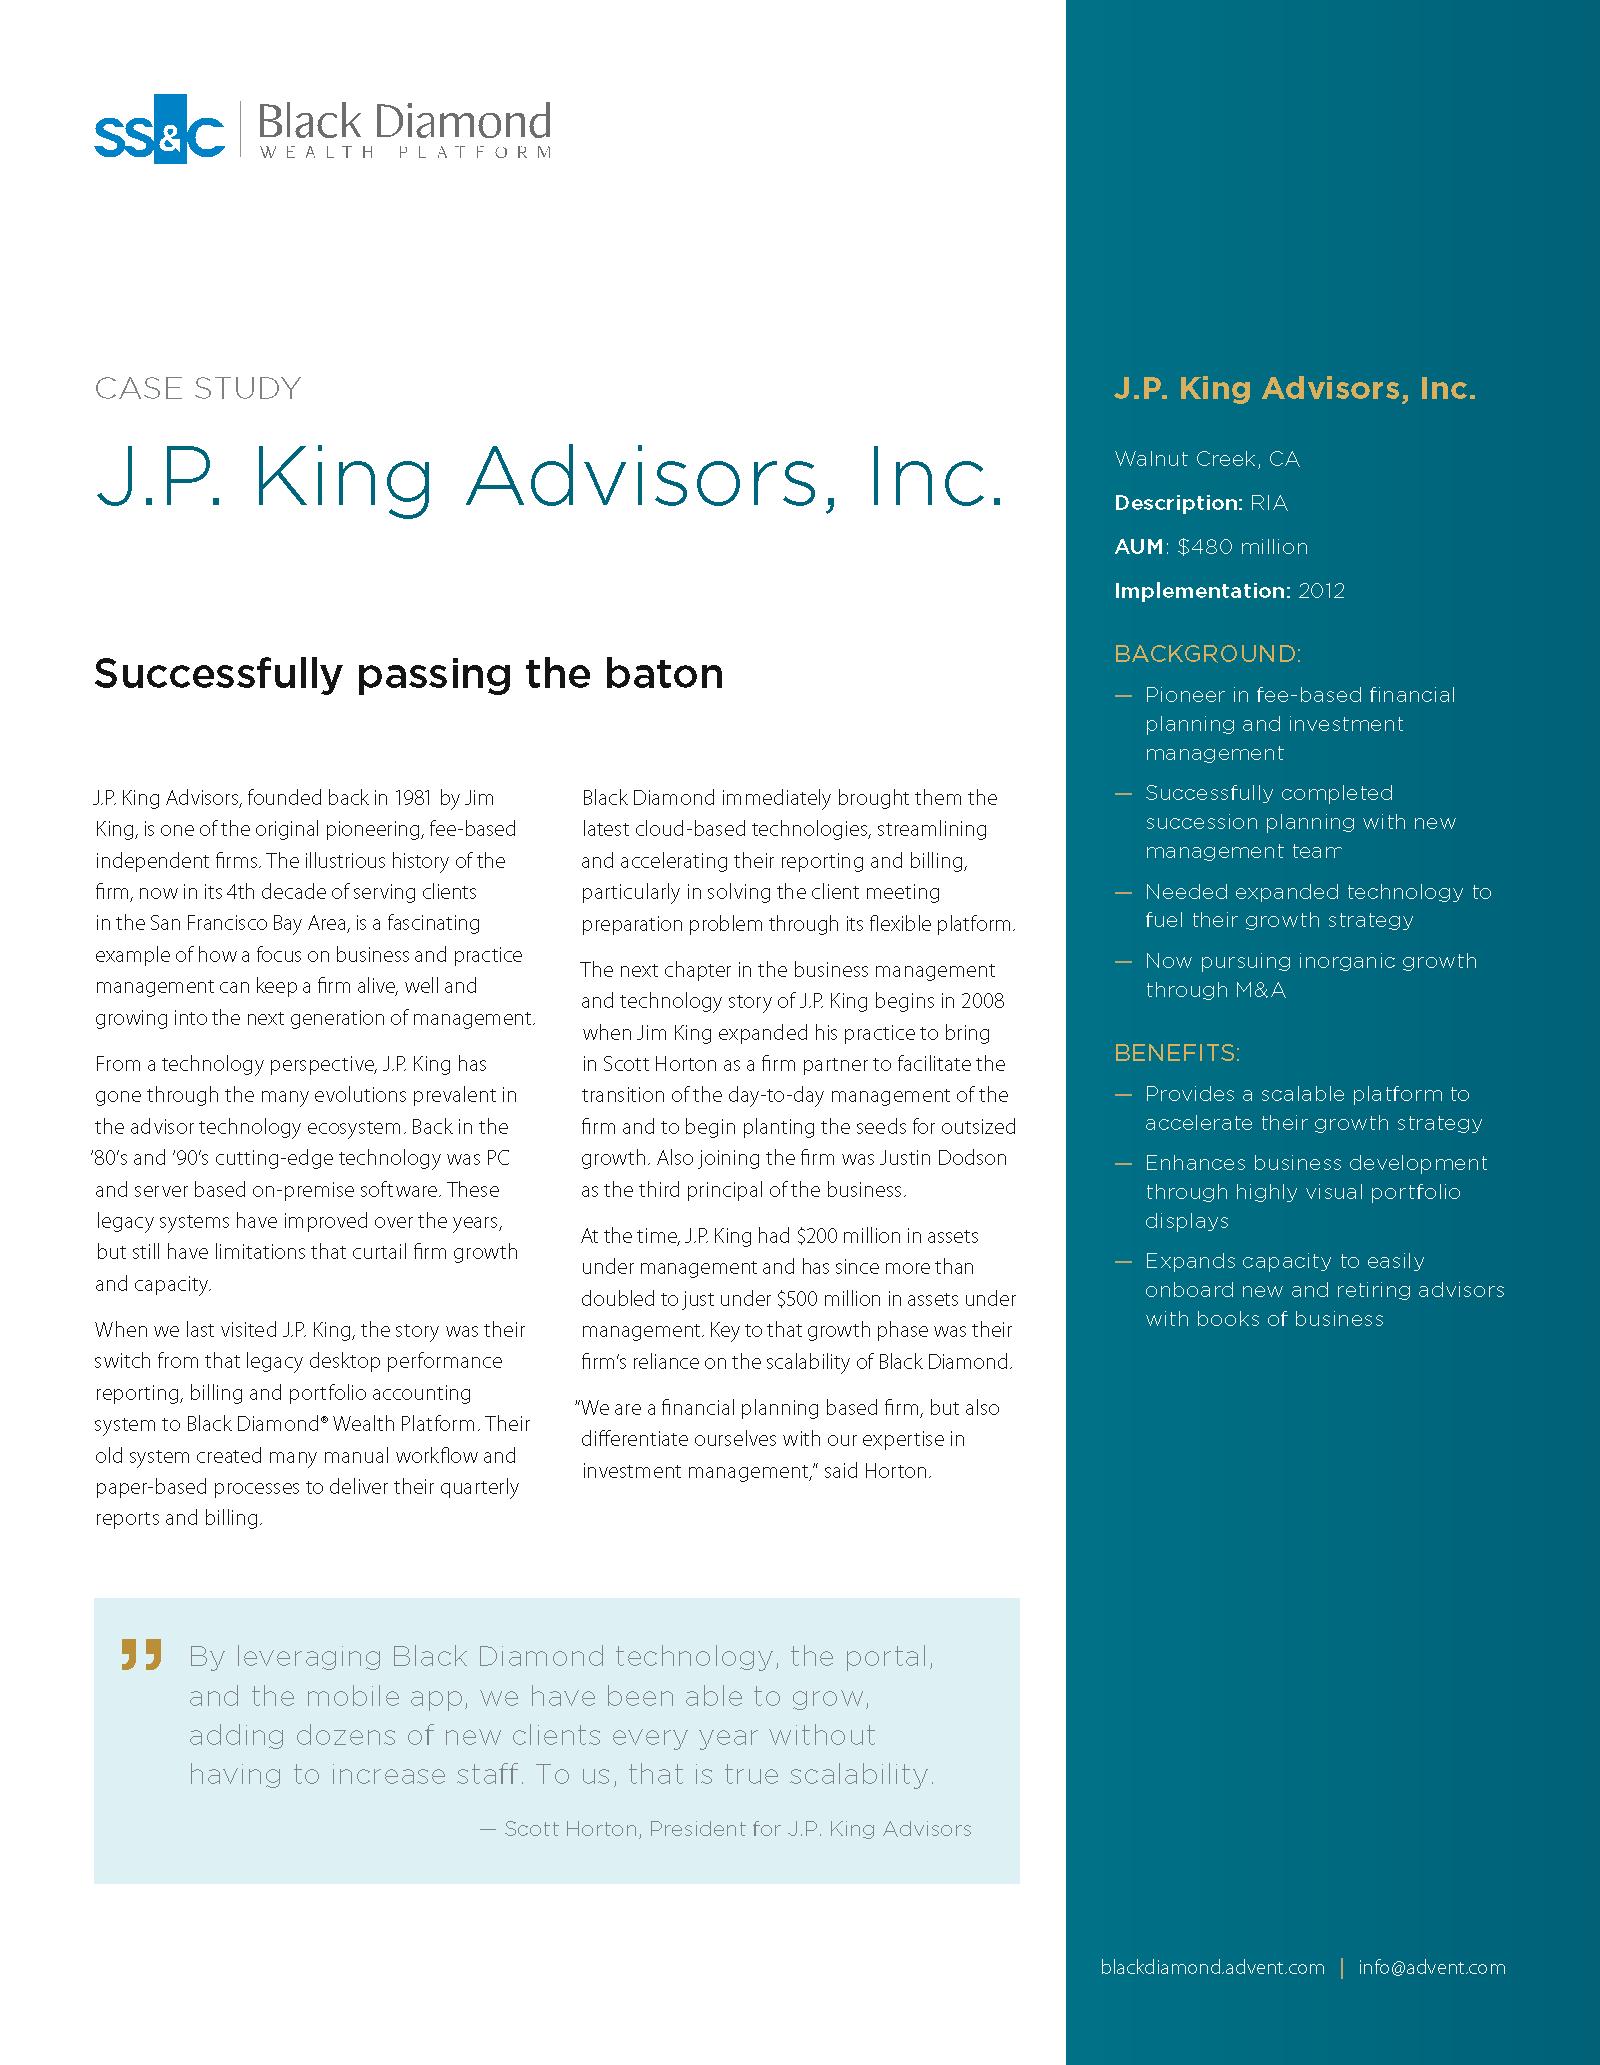 poster image for <p>J.P. King Advisors, Inc.</p>